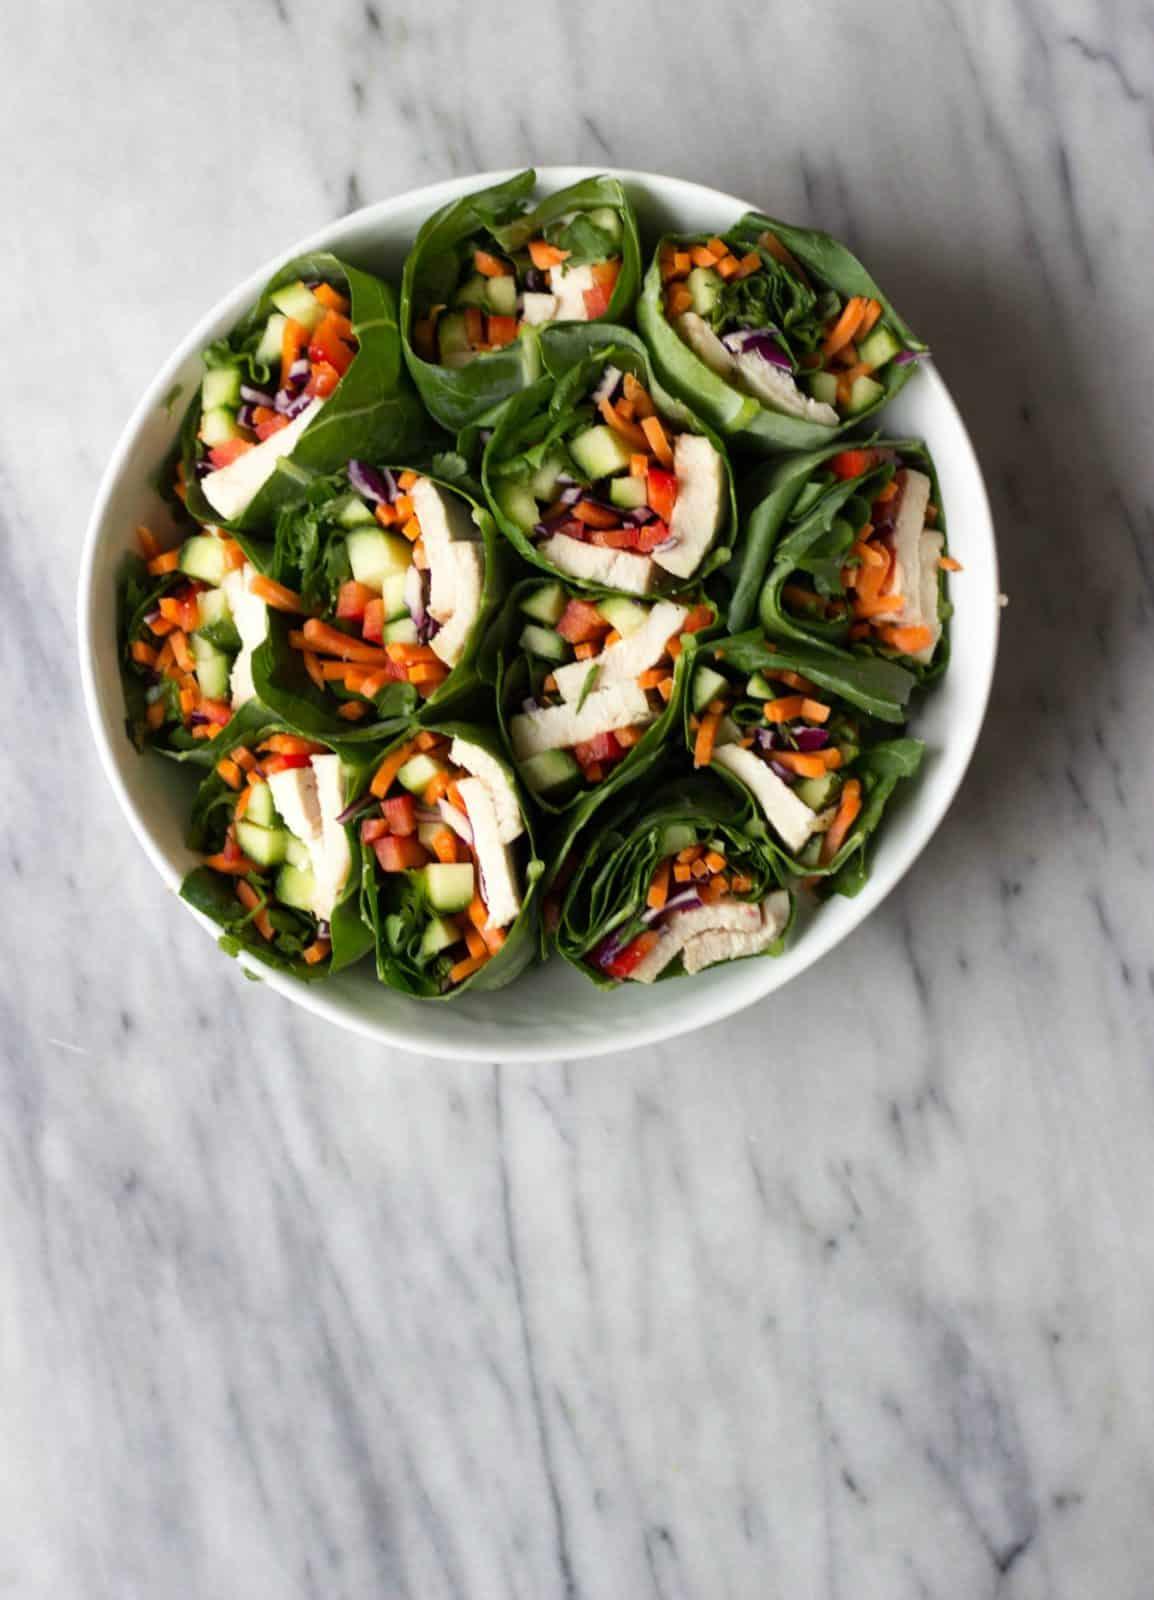 Hummus & Vegetable-Stuffed Collard Wraps in white bowl.